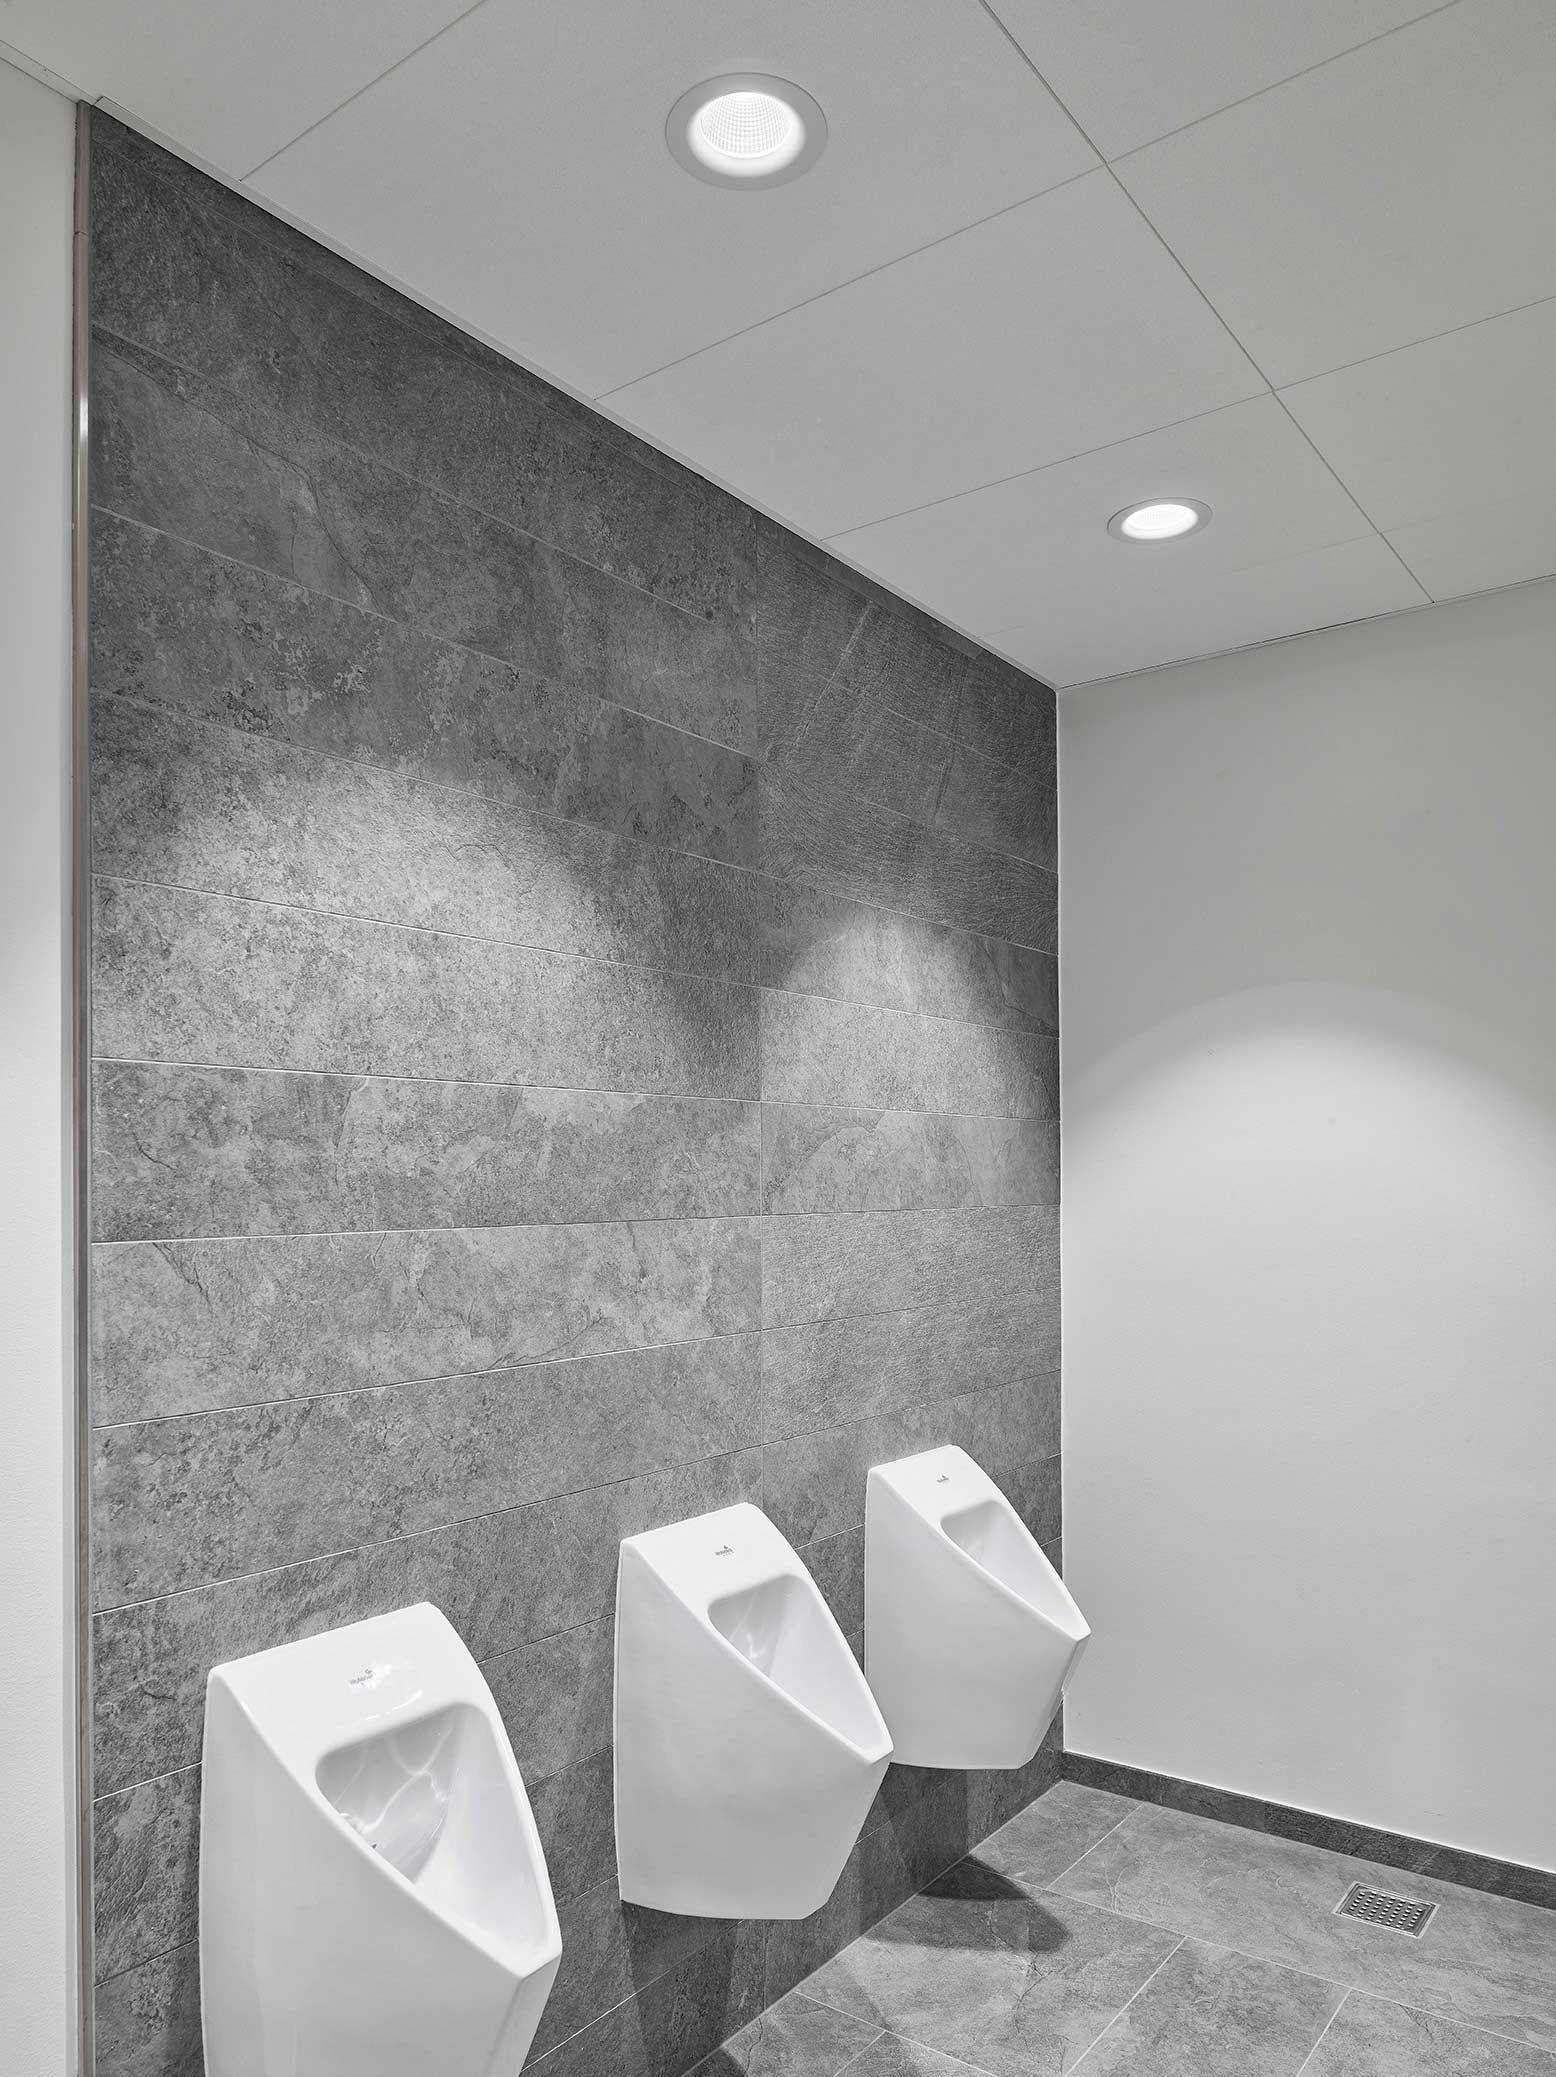 Hotel Alsik i Sønderborg Indbygget i loft Linia DS-F 150 på toiletter